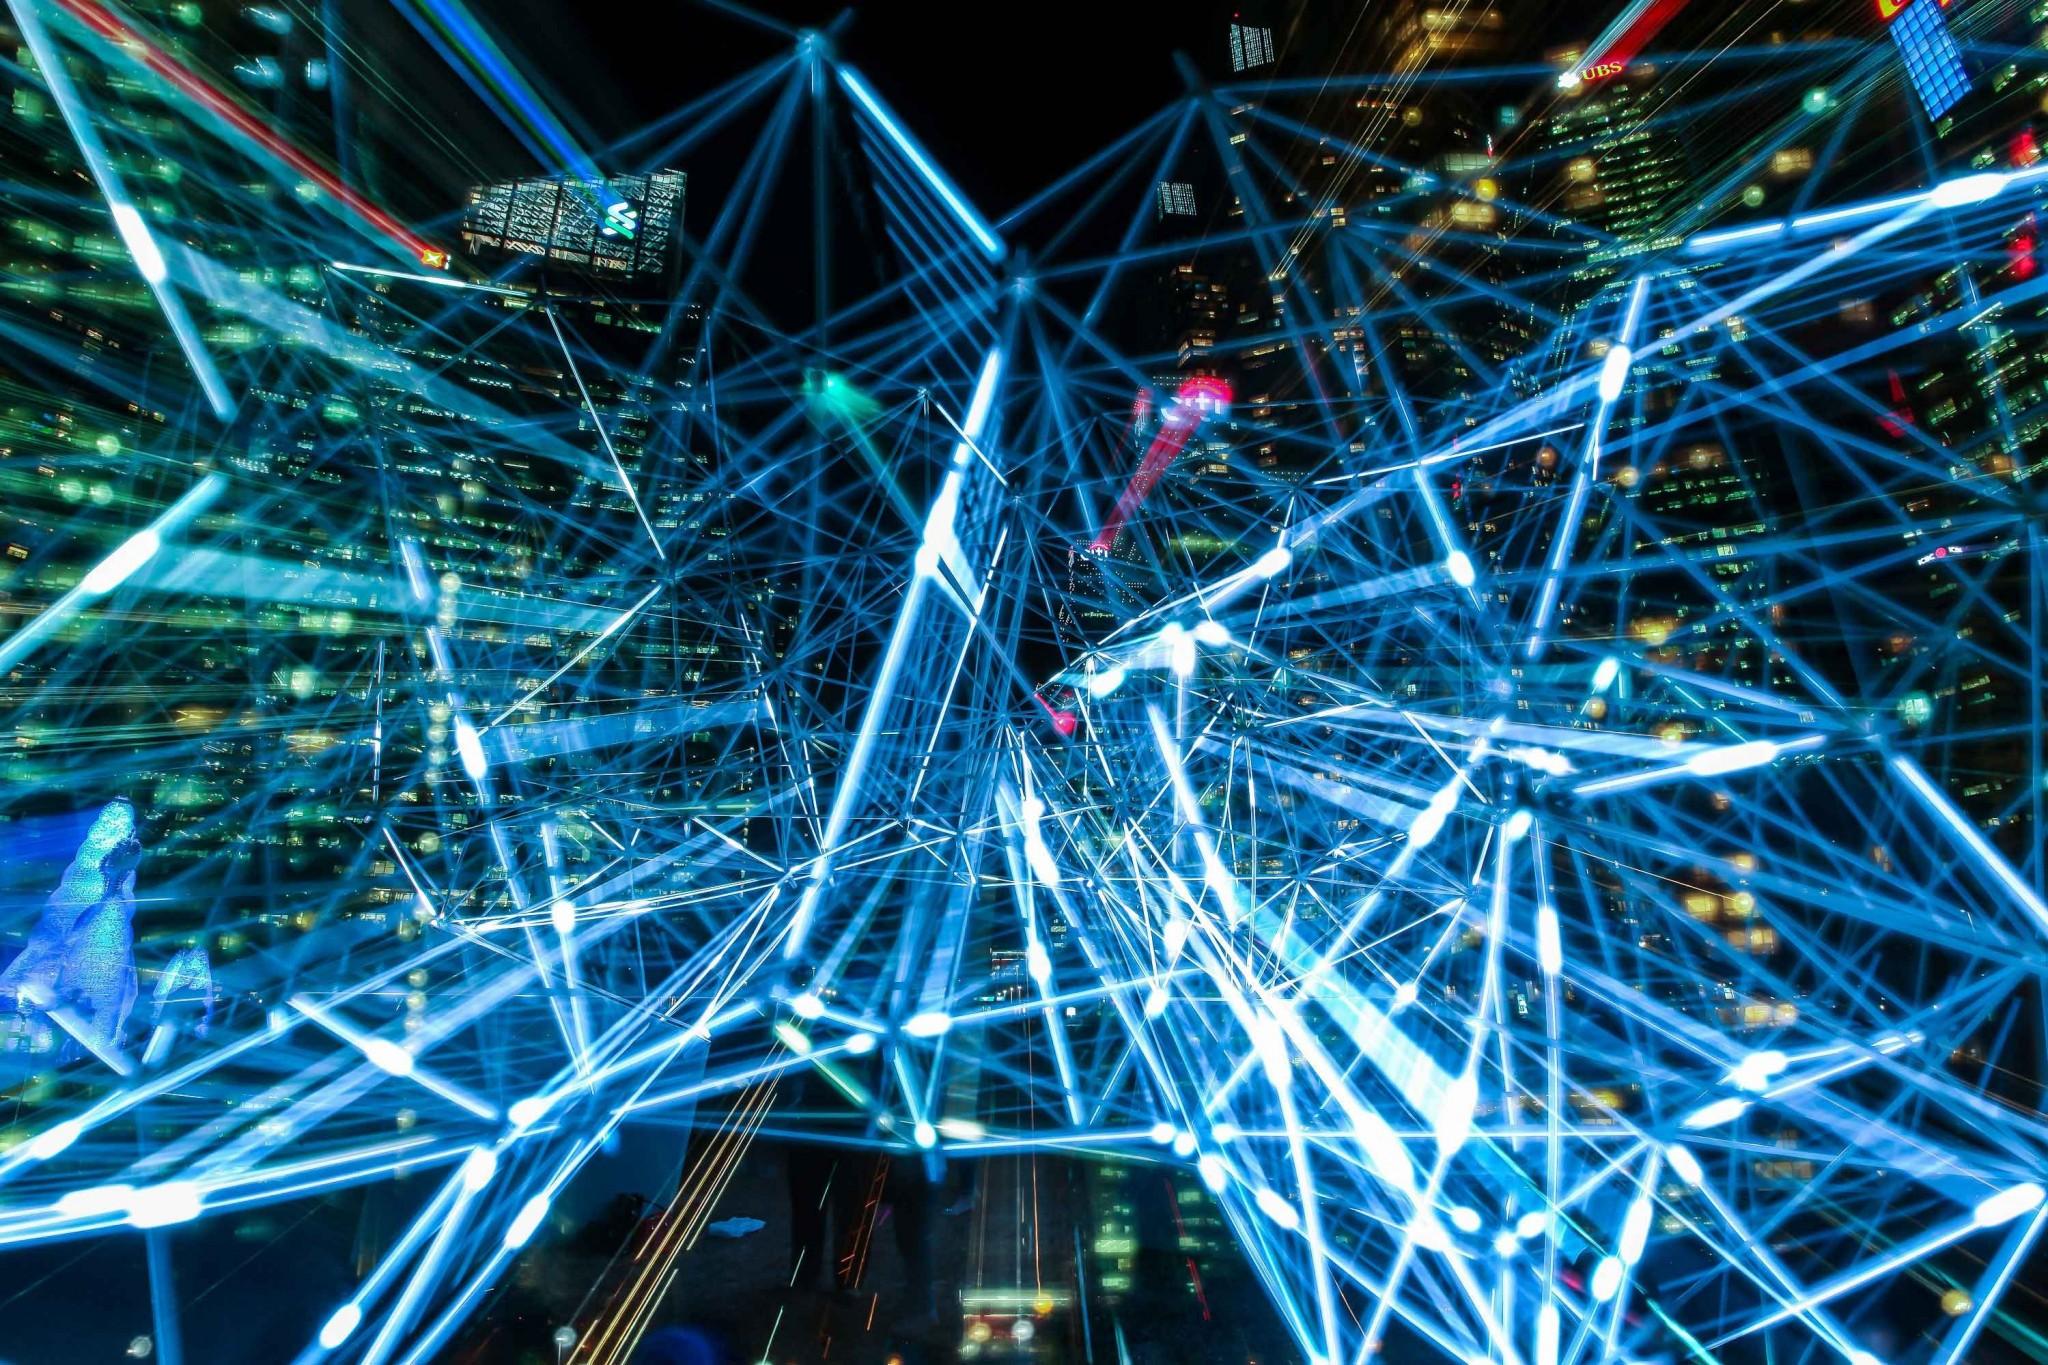 abstract-art-blur-bright-373543